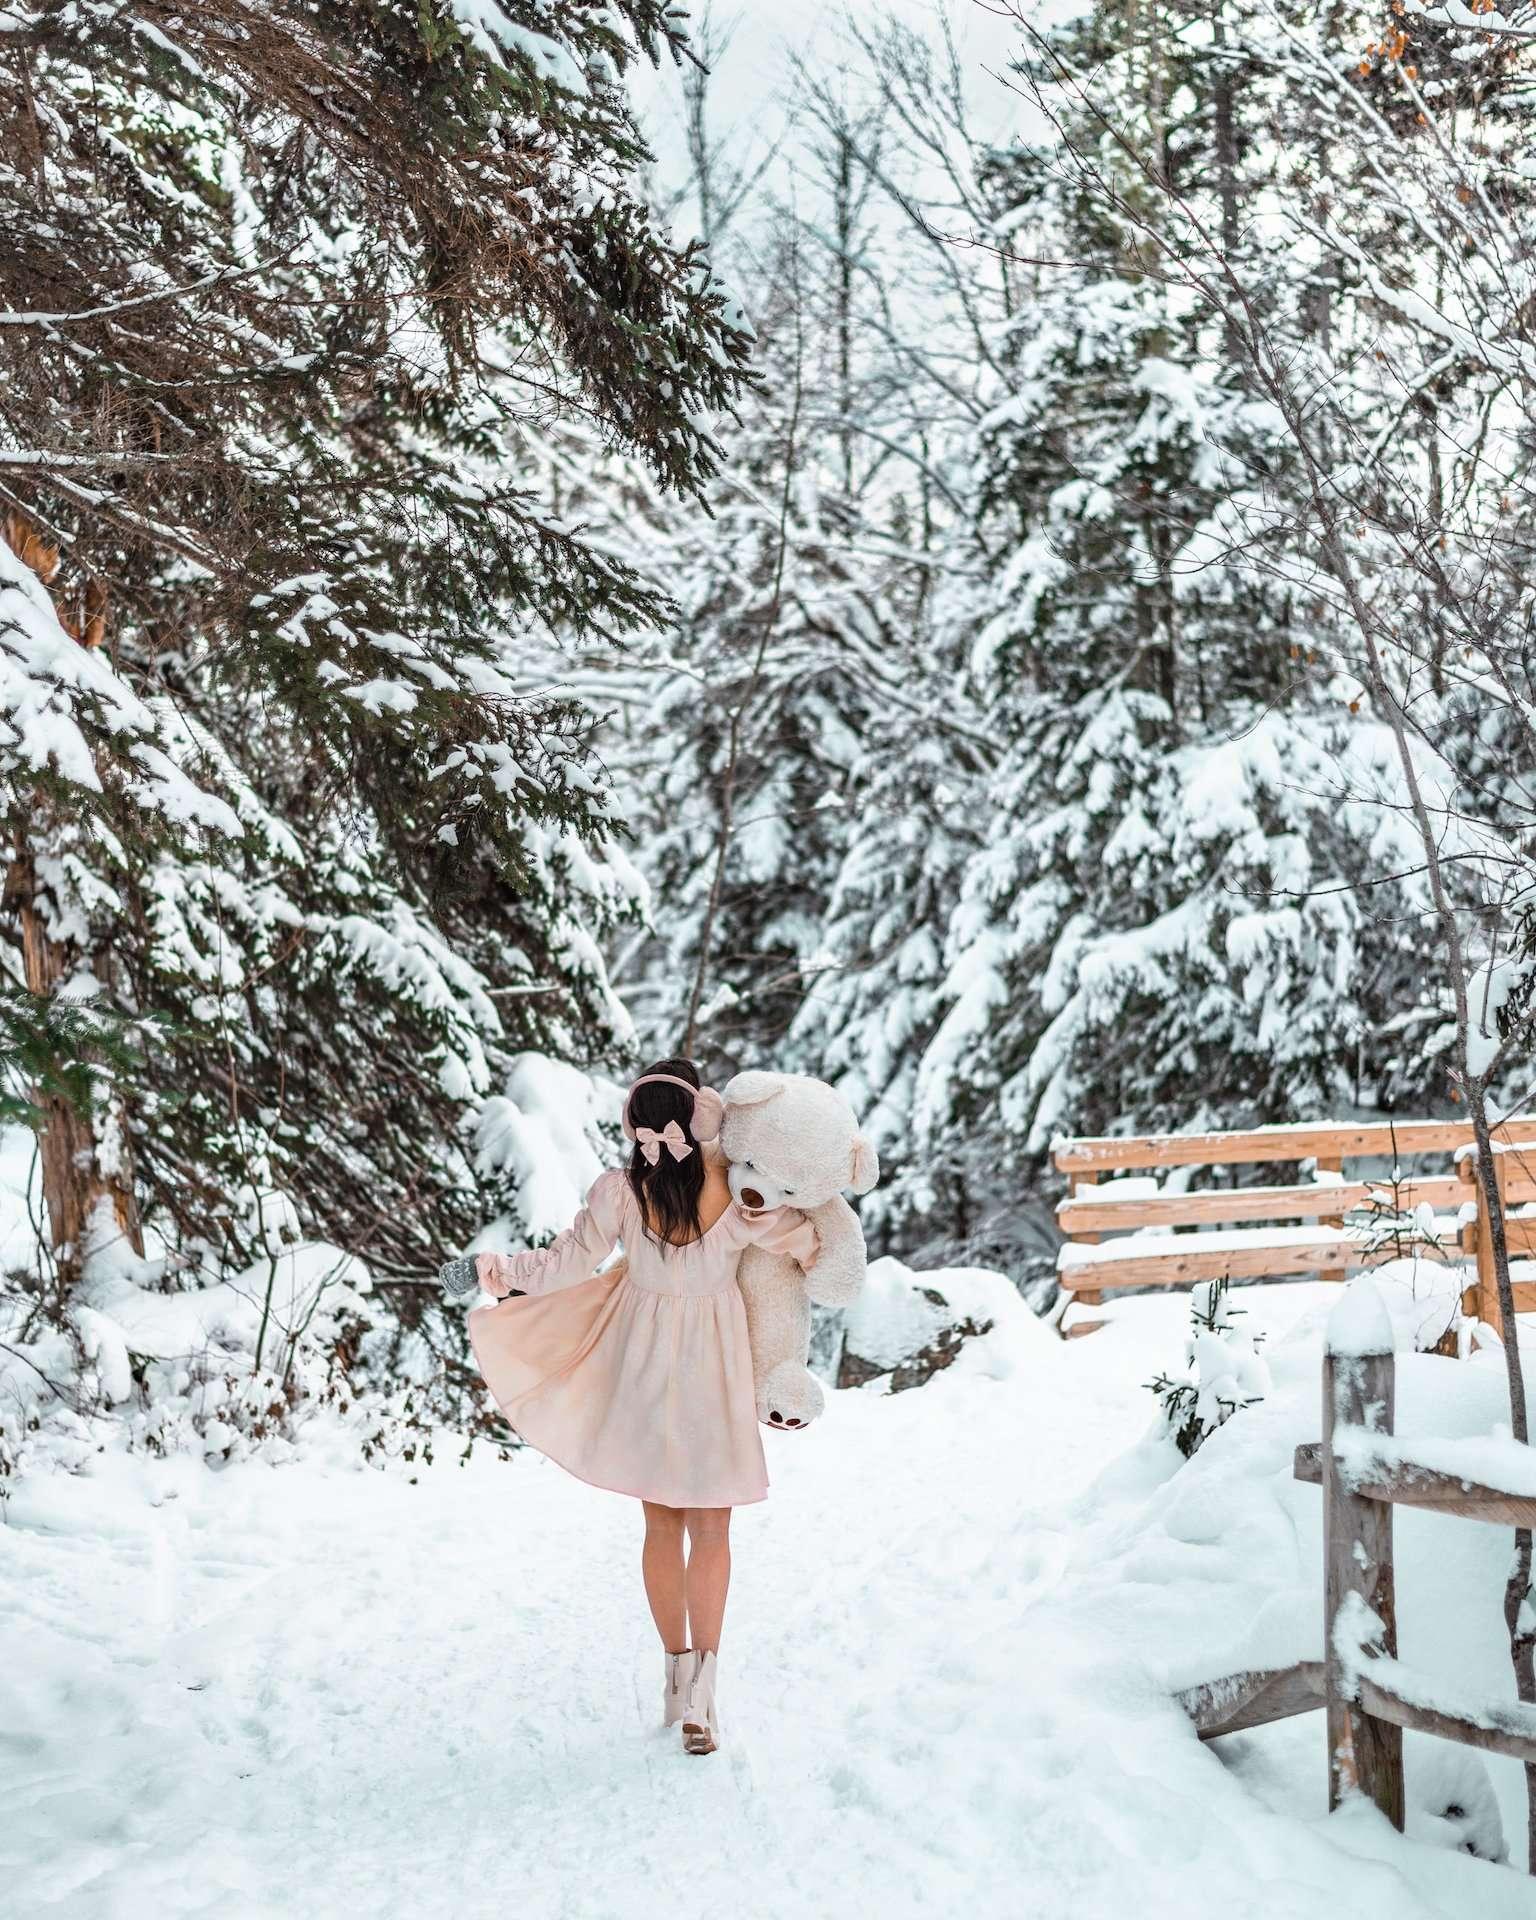 girl with oversized teddy bear in snowy woods